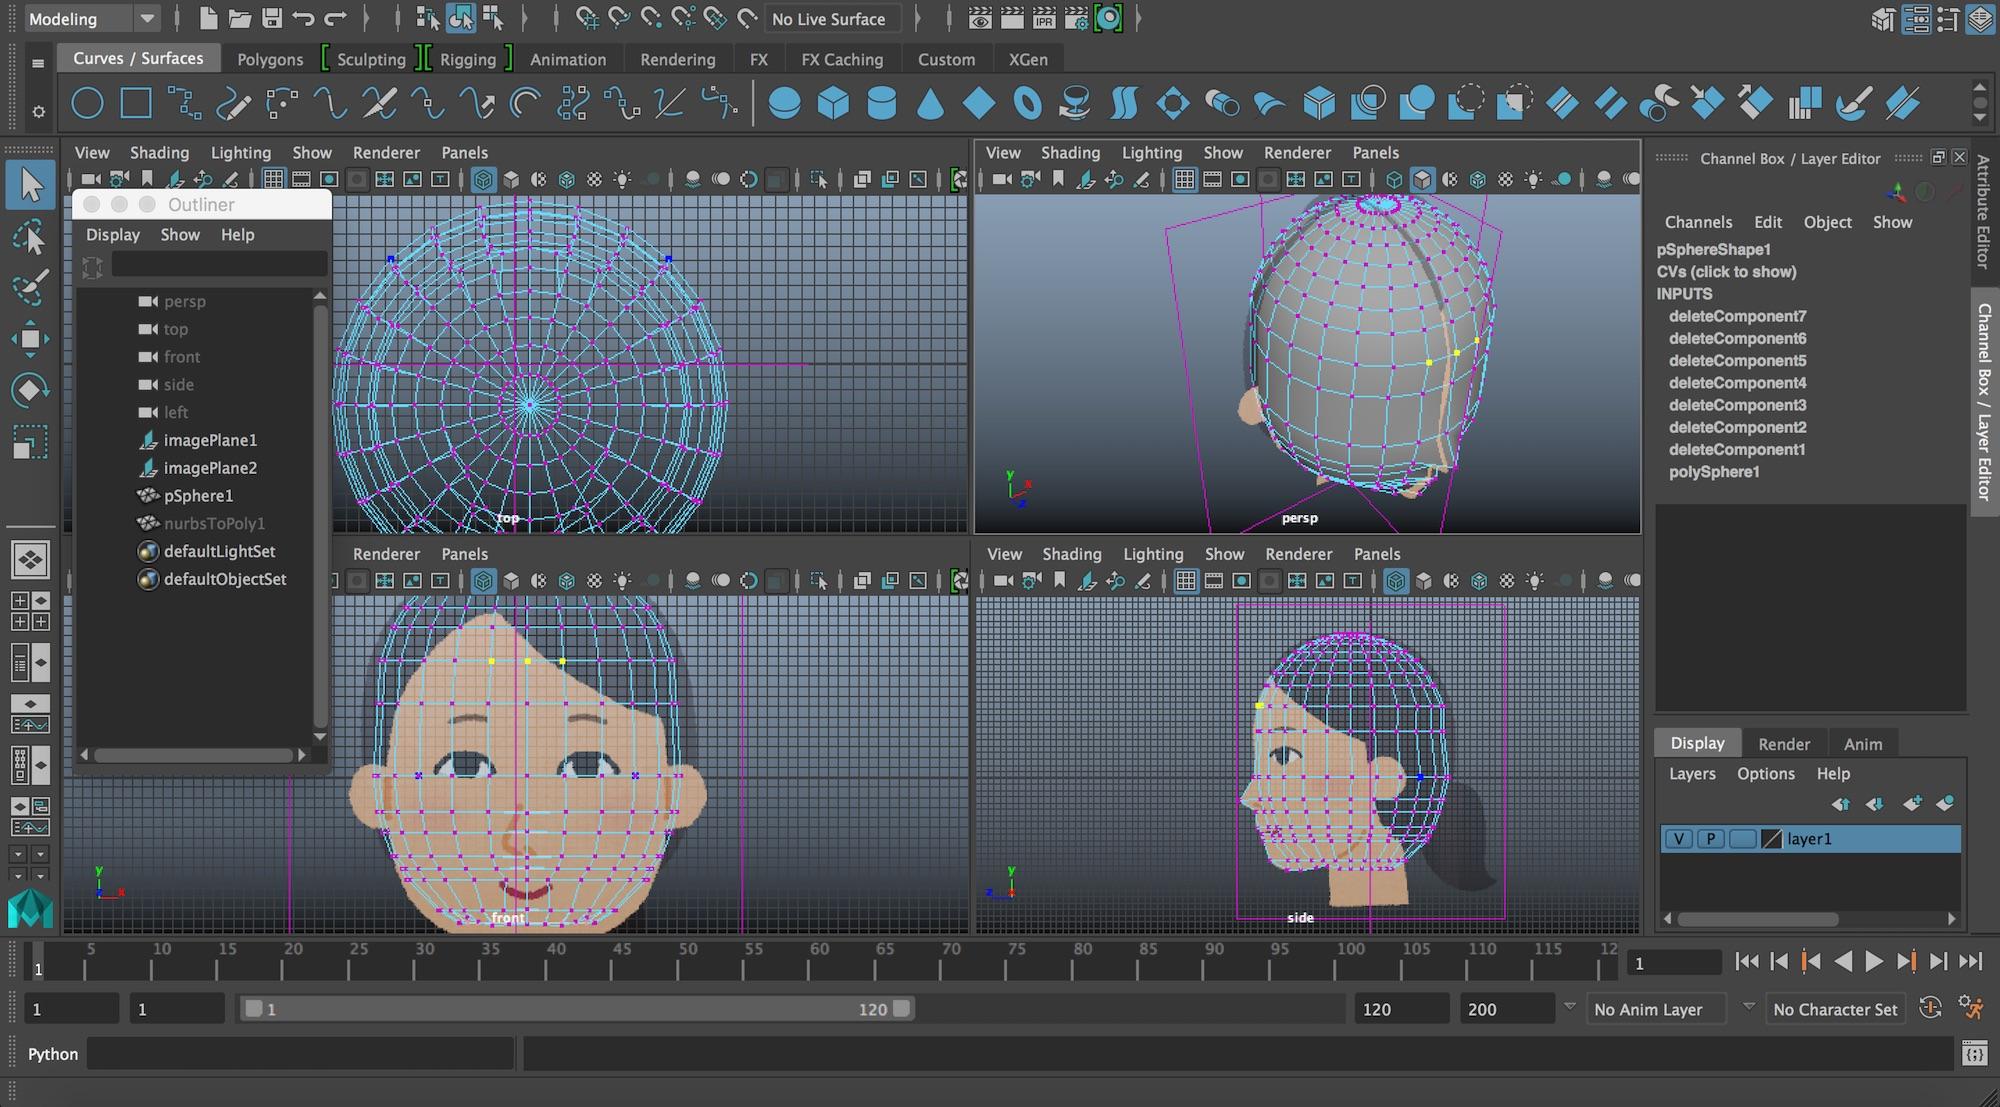 Autodesk Mayaキャラクタ(頭部)のモデリング